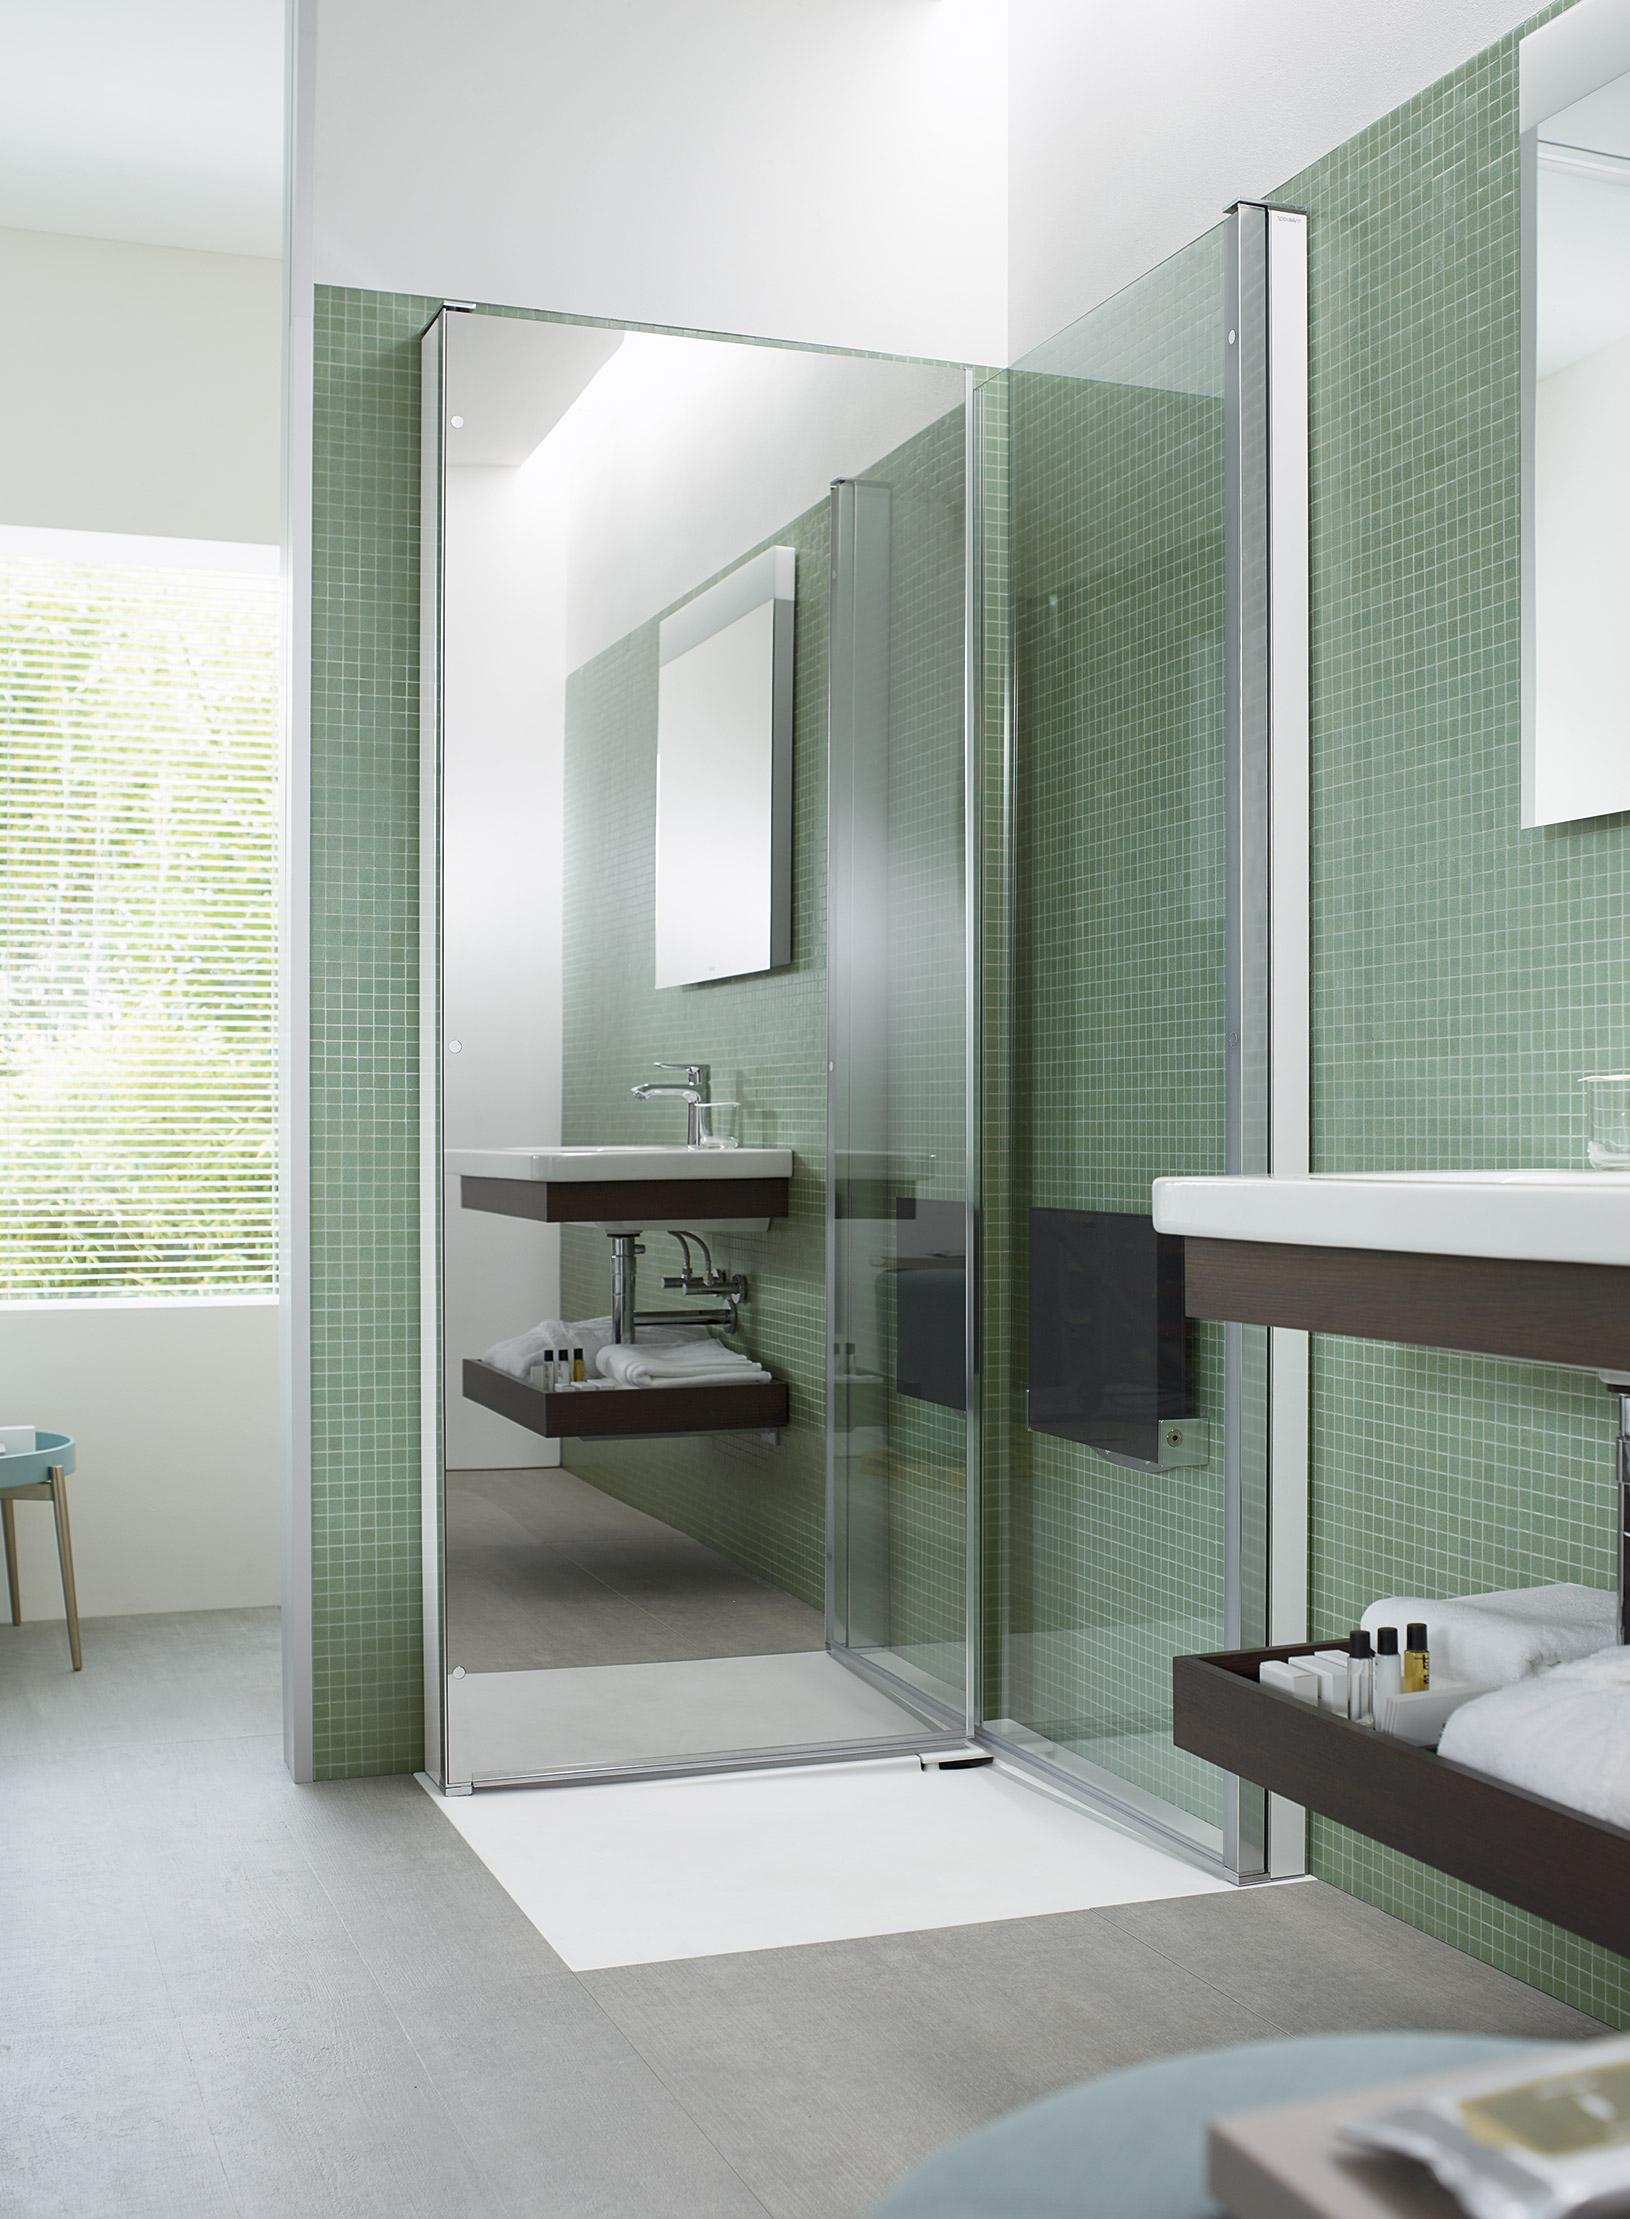 openspace b duravit. Black Bedroom Furniture Sets. Home Design Ideas